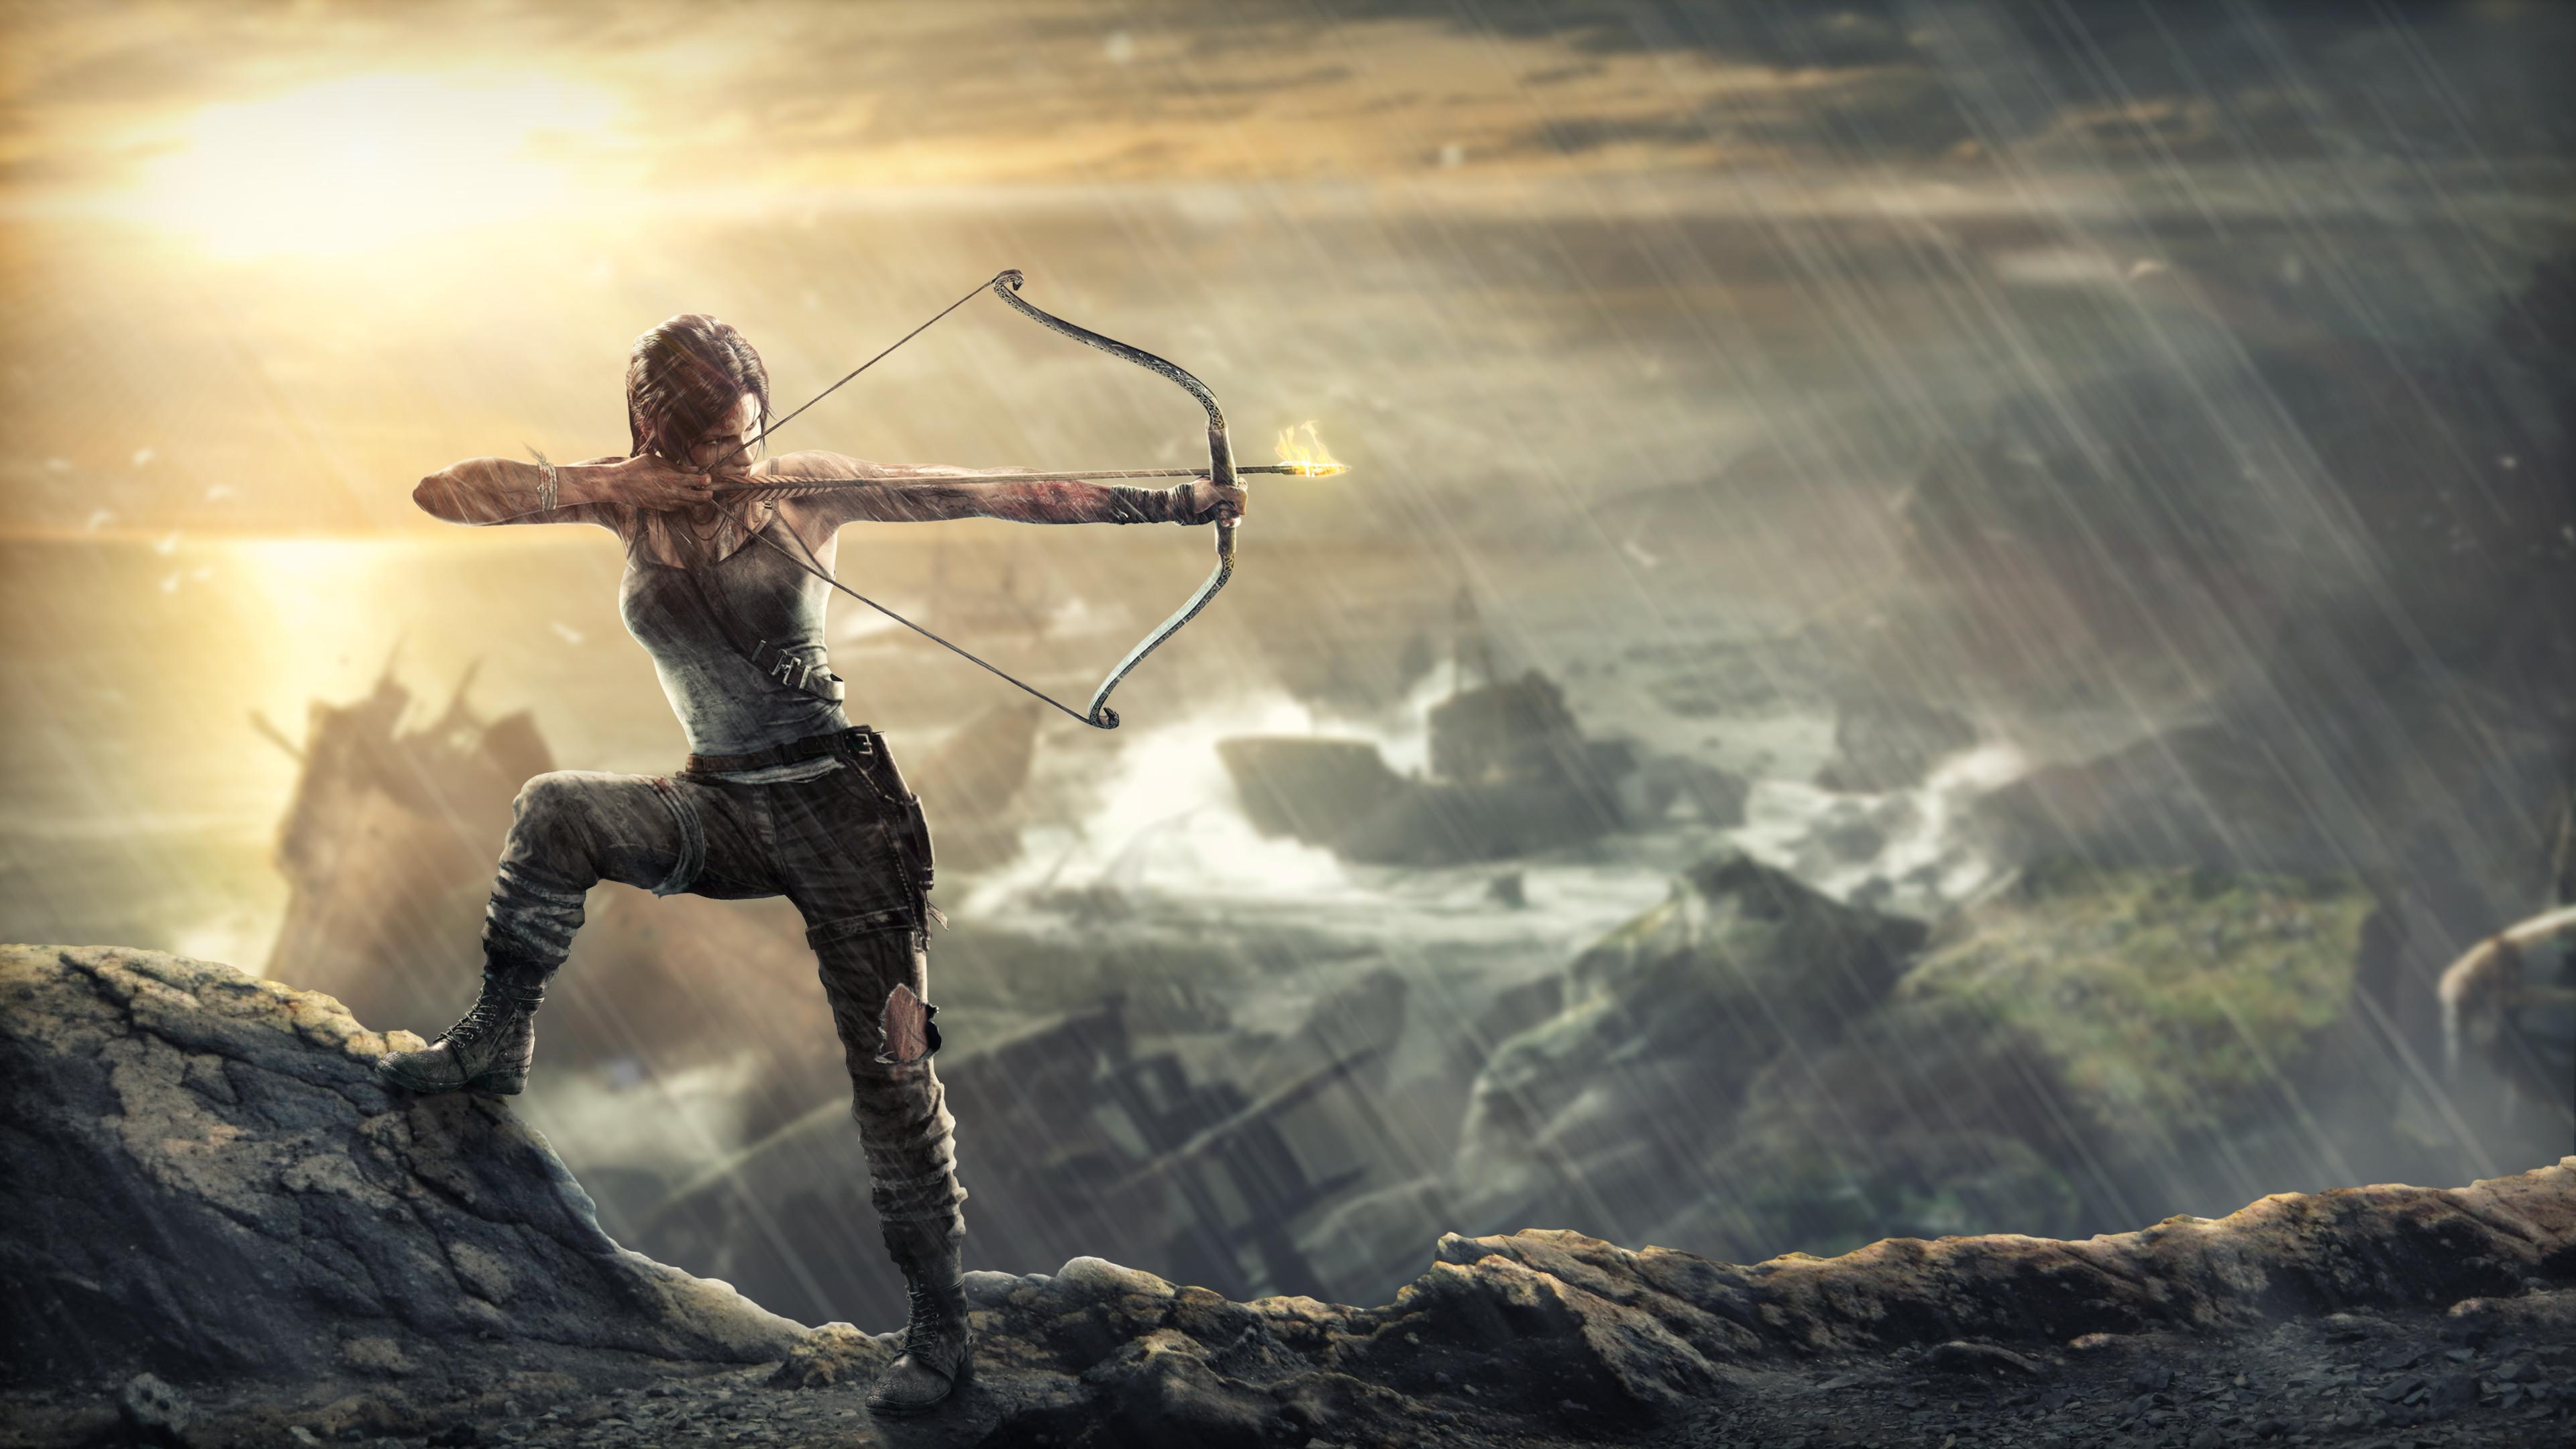 Tomb Raider 2018 HD Wallpaper (76+ images)